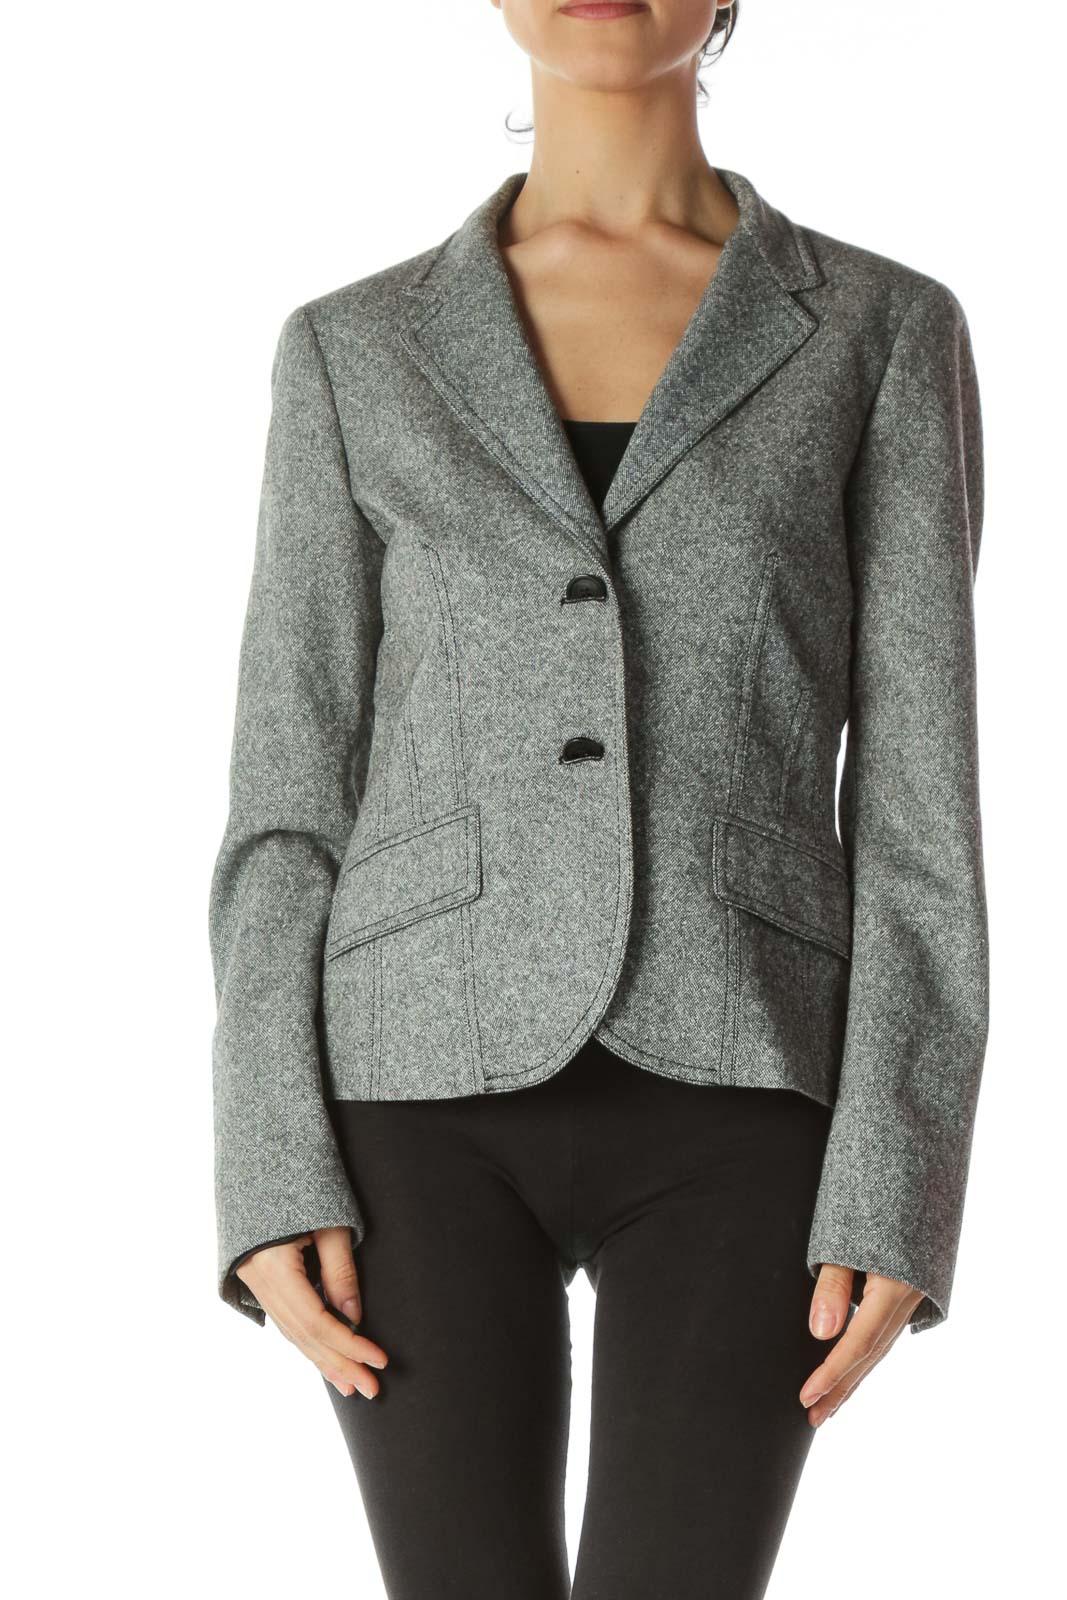 Black White Birdseye Knit Buttoned Blazer Front